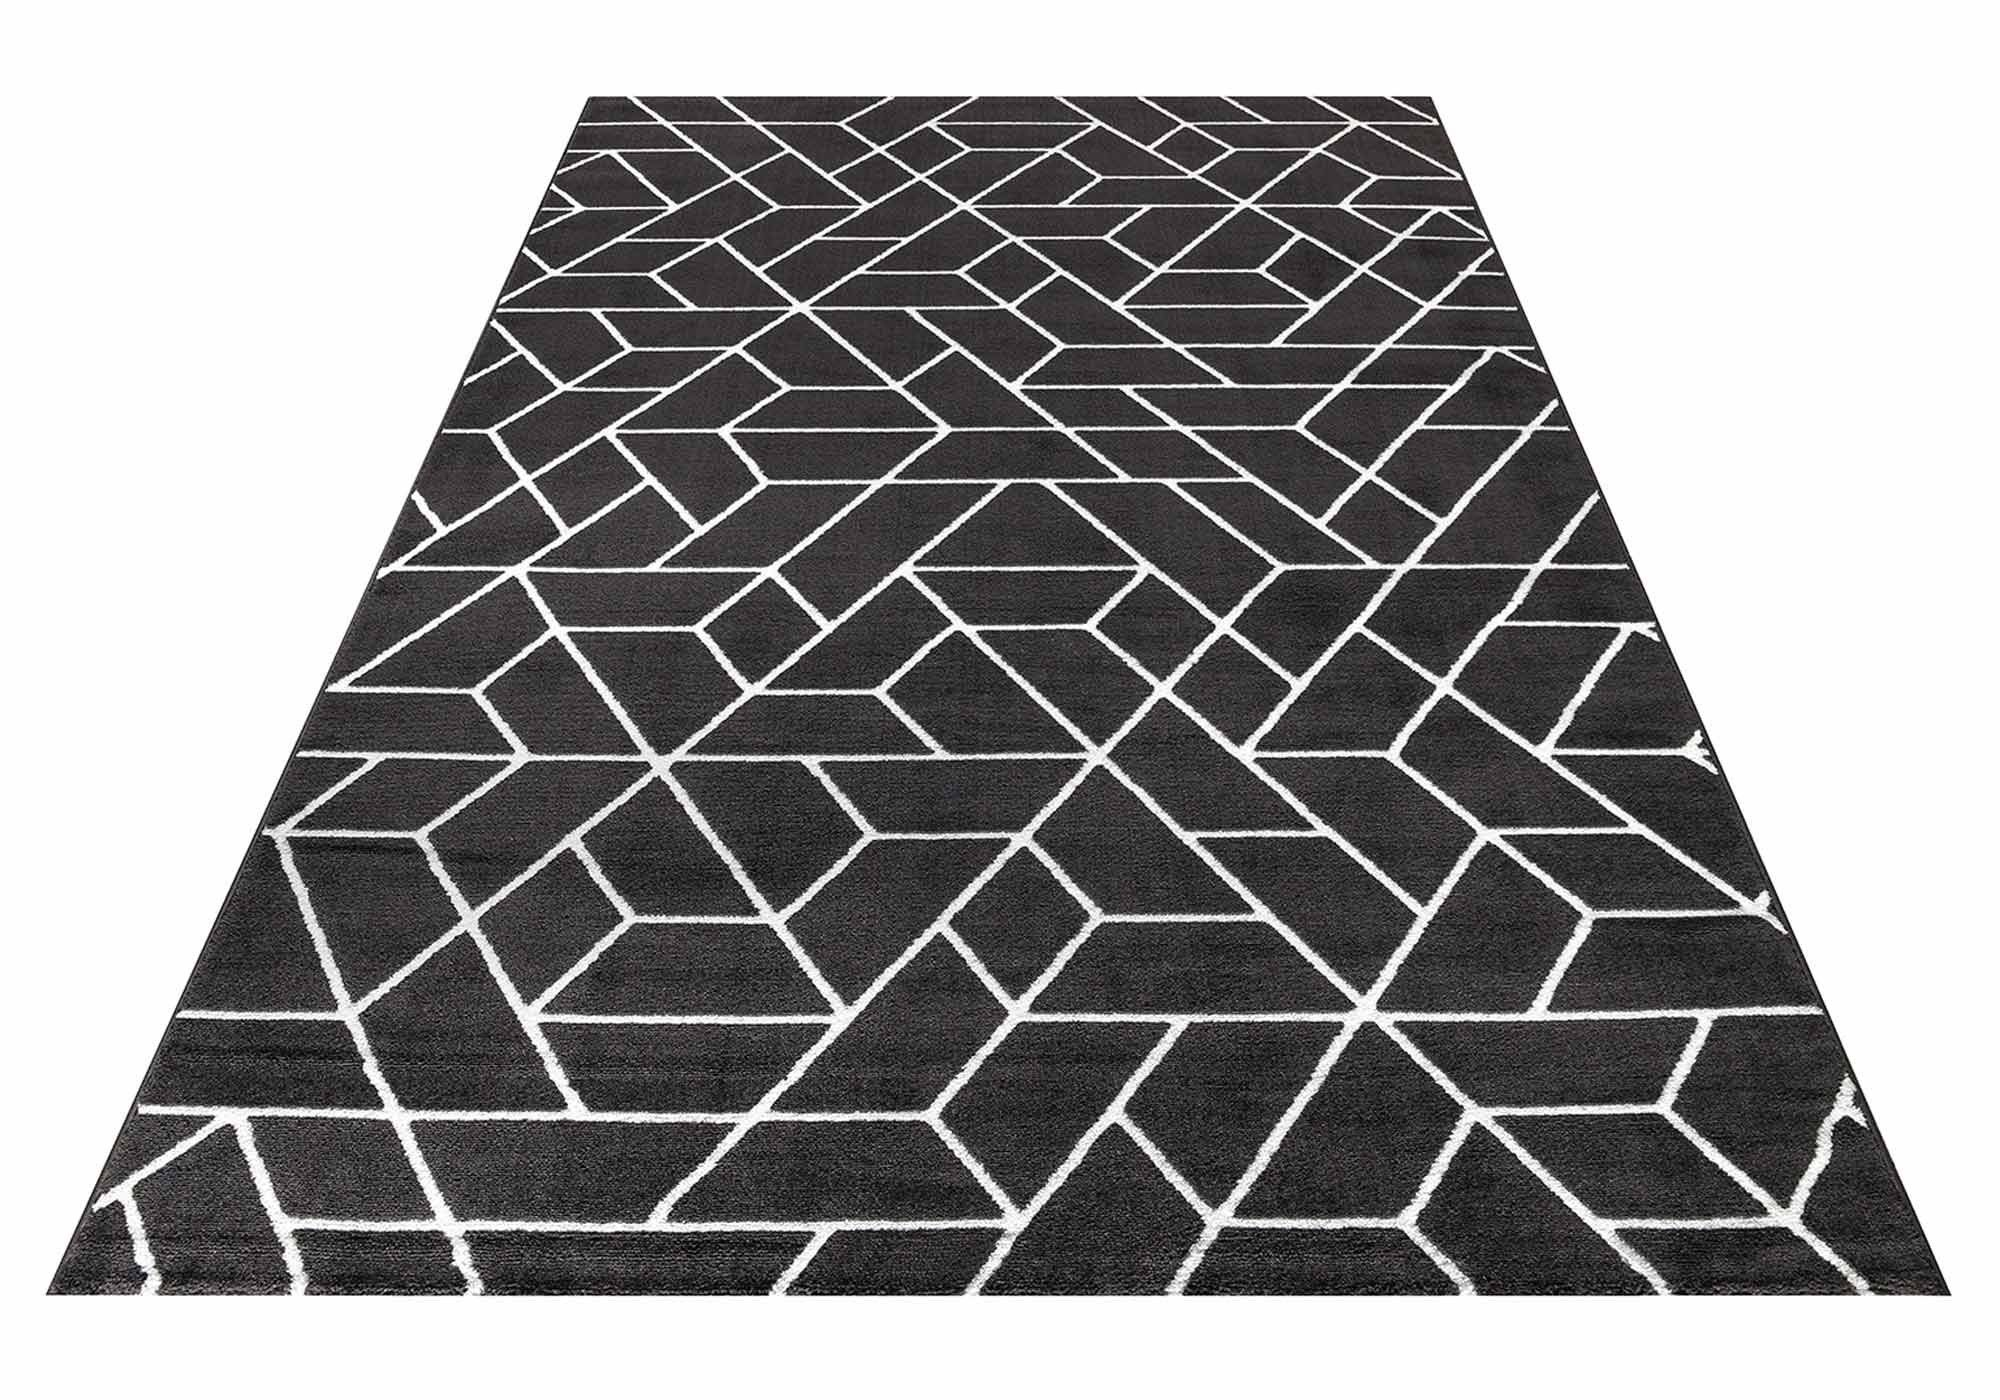 Teppich 80 cm x 150 cm - grau - weiß - Helsinki183